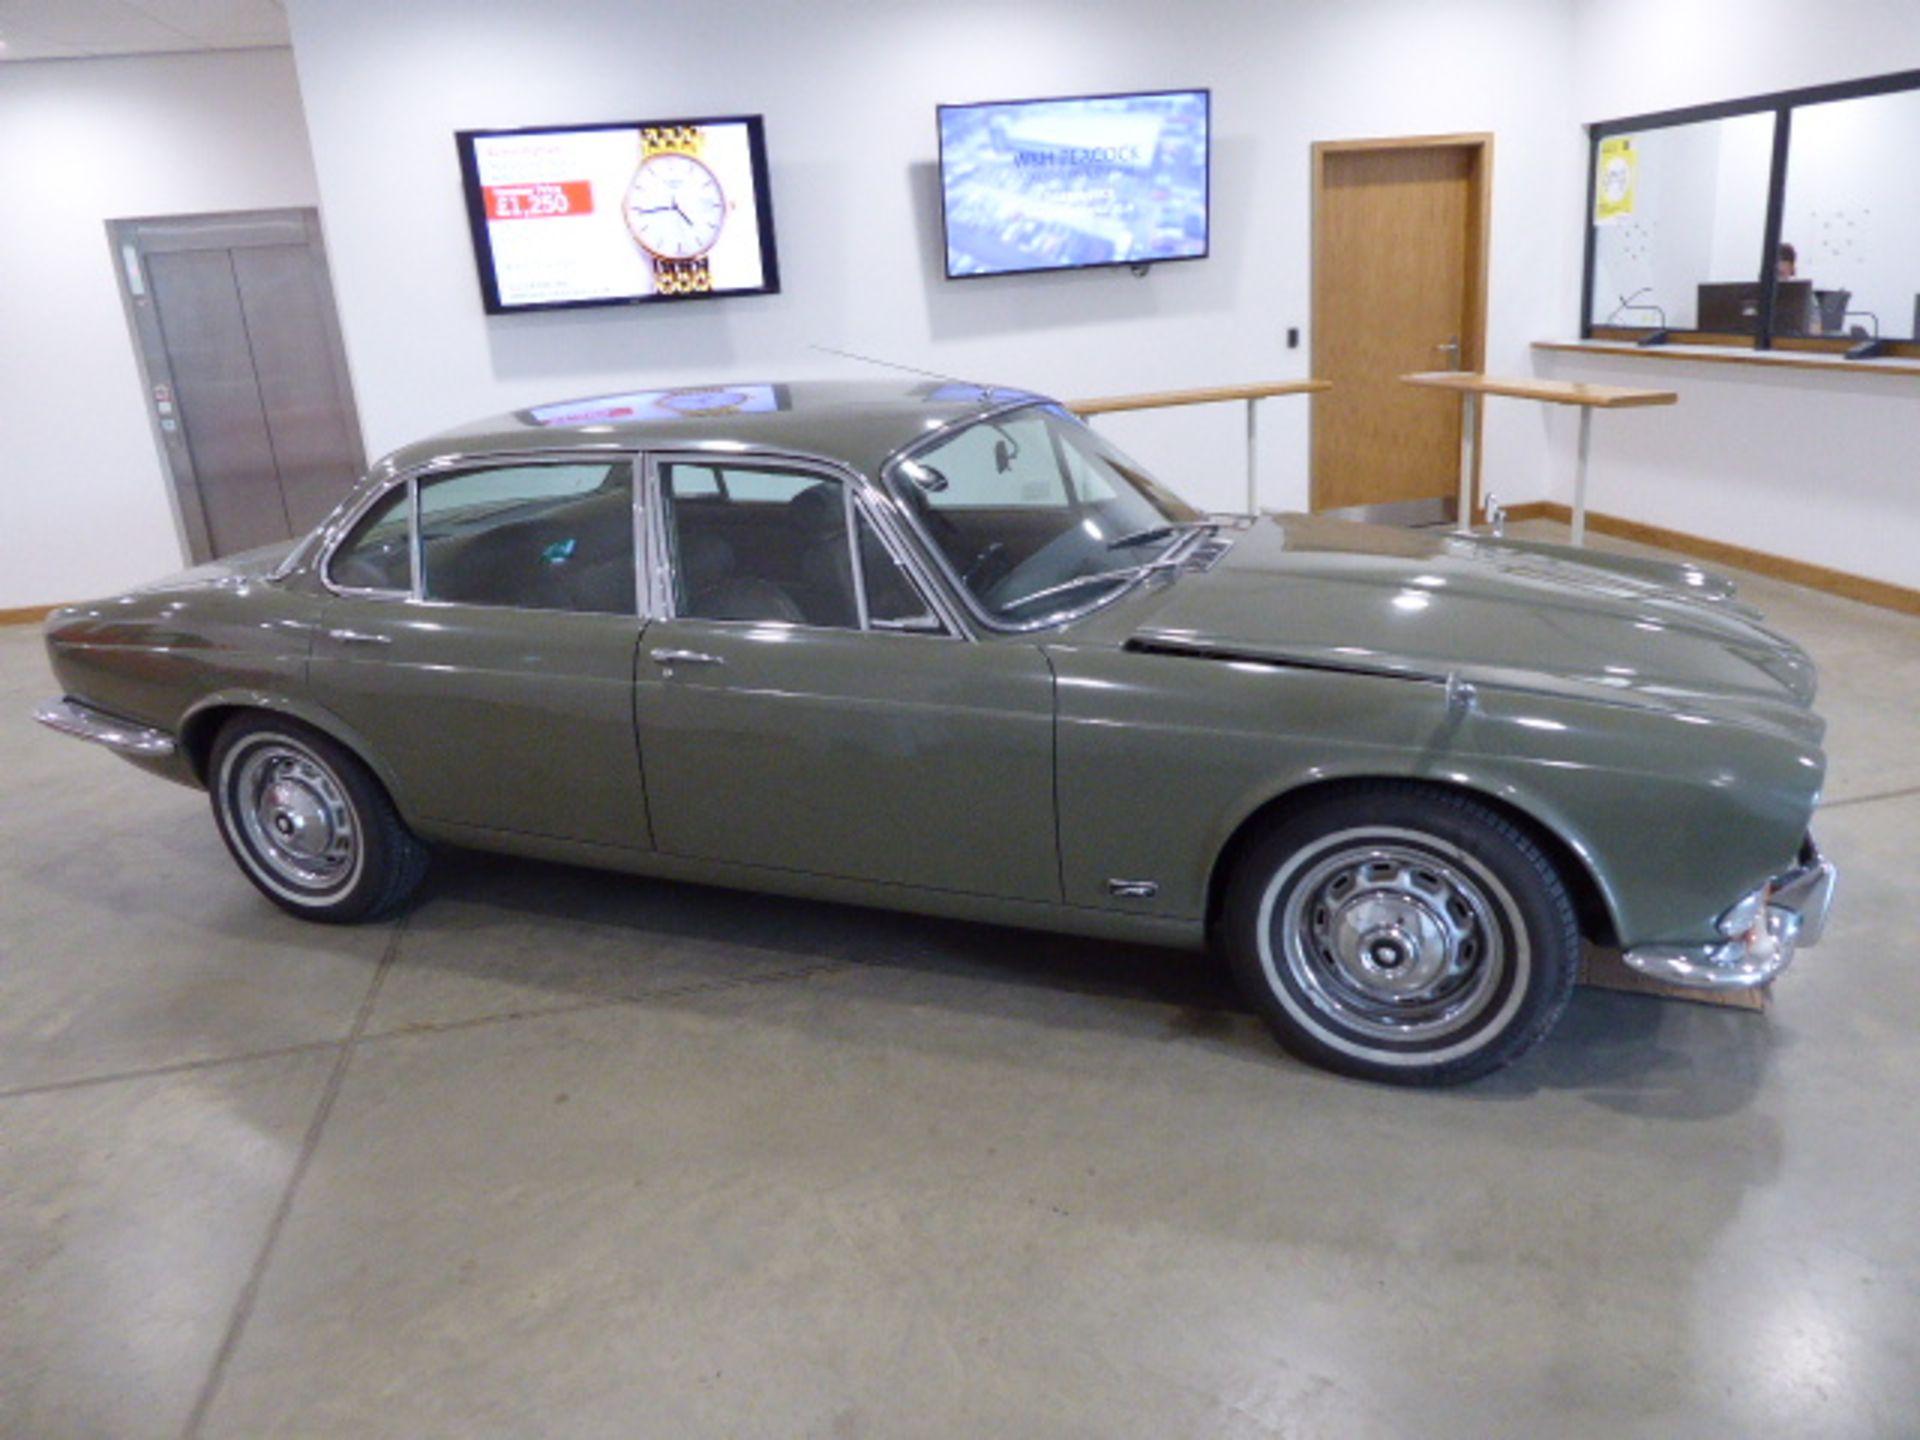 Lot 4001 - RXF 914L (1973) A sought after LWB 1973 Jaguar Series 1 XJ12, Automatic, Taxation class Historic